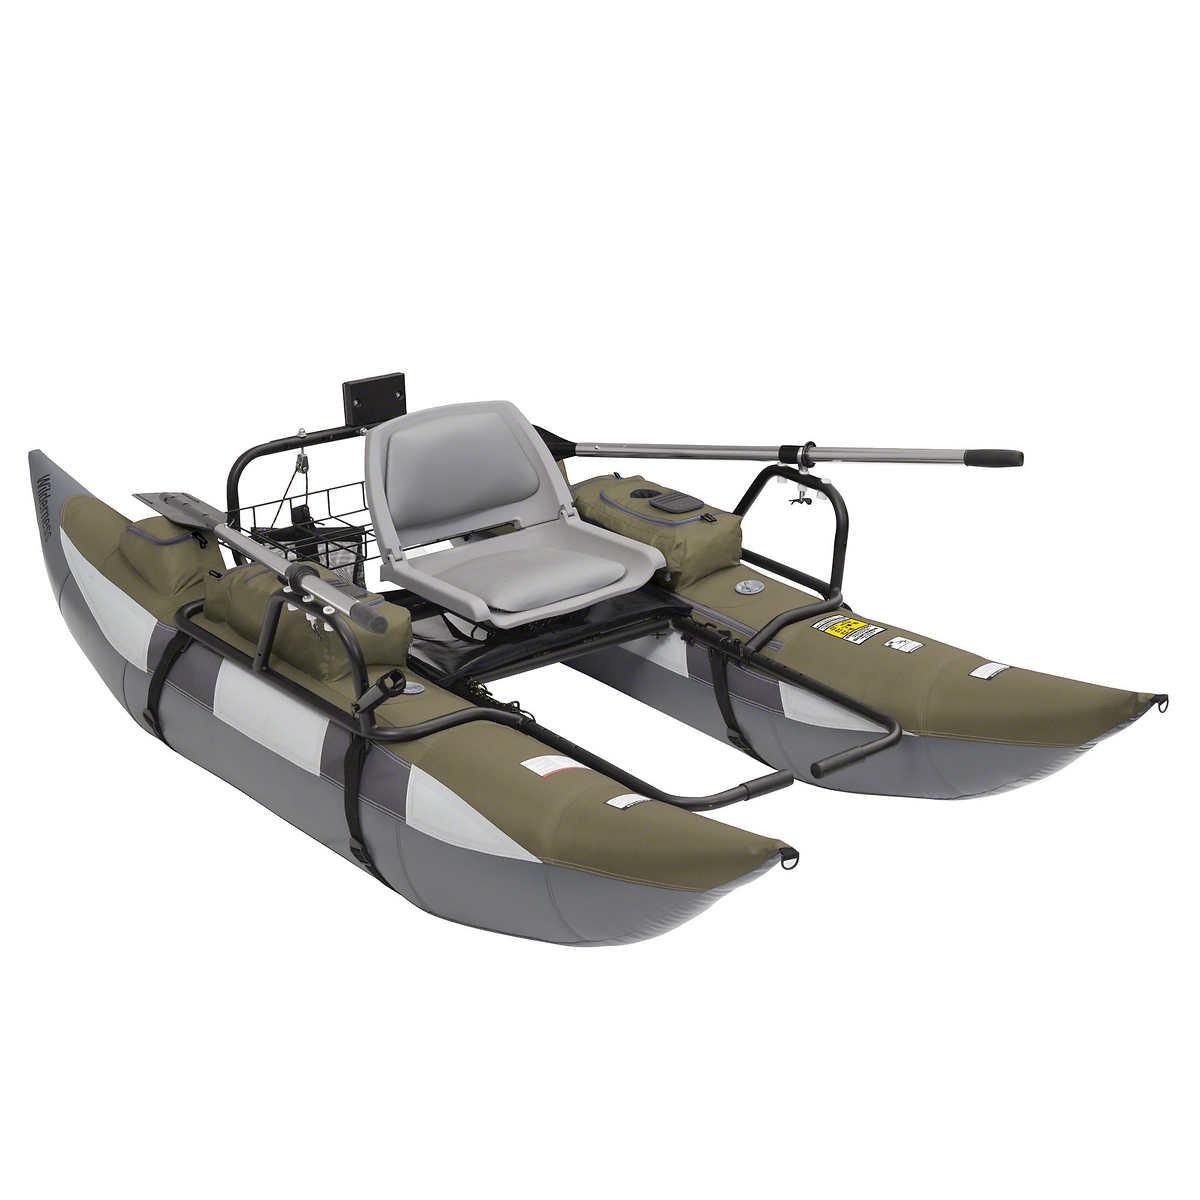 Wilderness 9' Inflatable Pontoon Boat